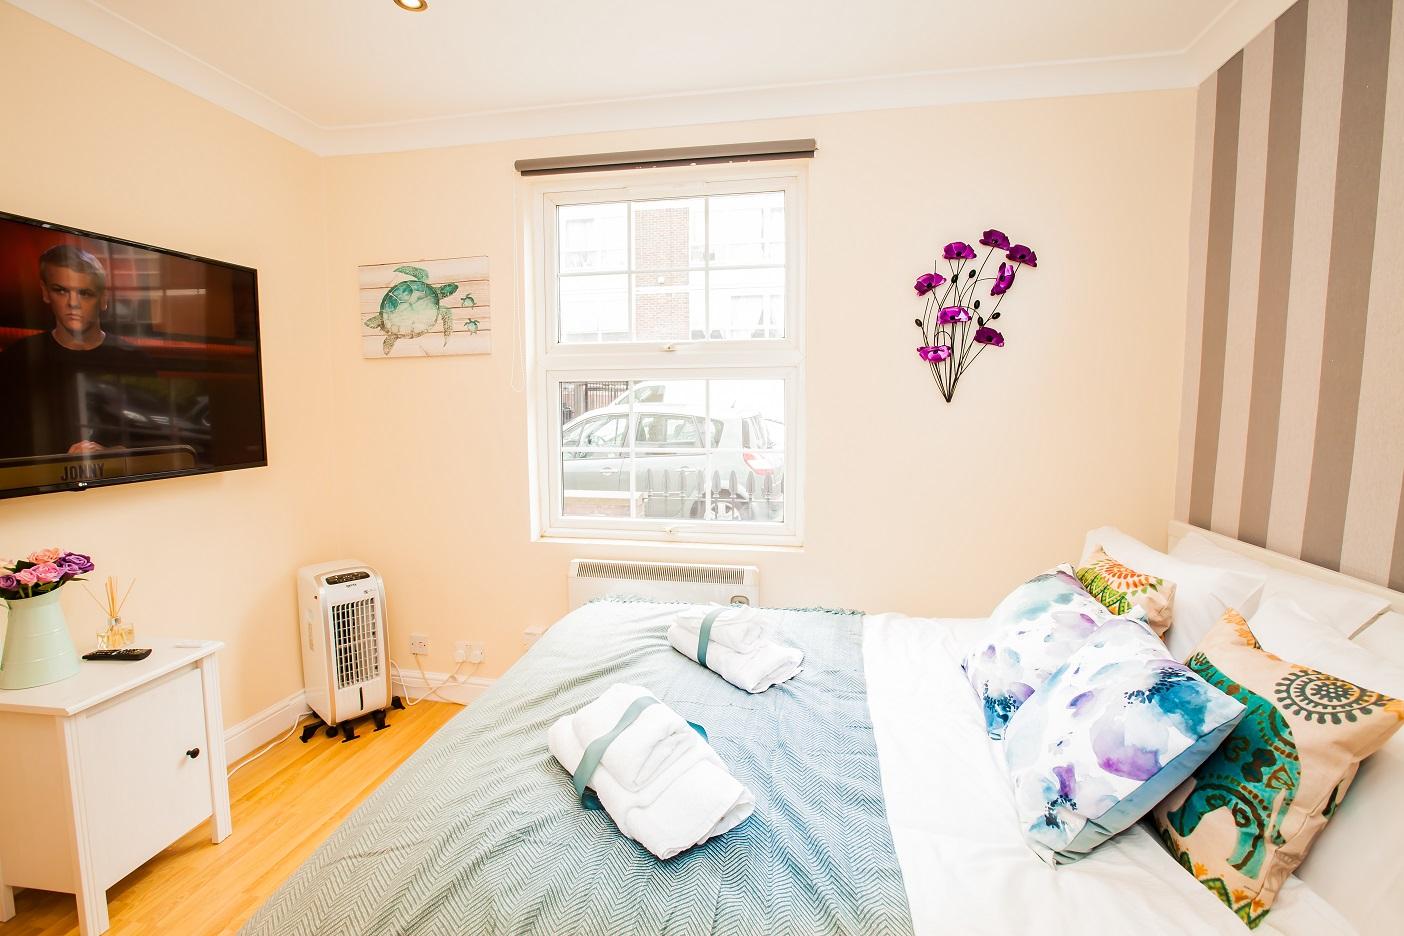 Bedroom at Marylebone Serviced Apartments, Marylebone, London - Citybase Apartments